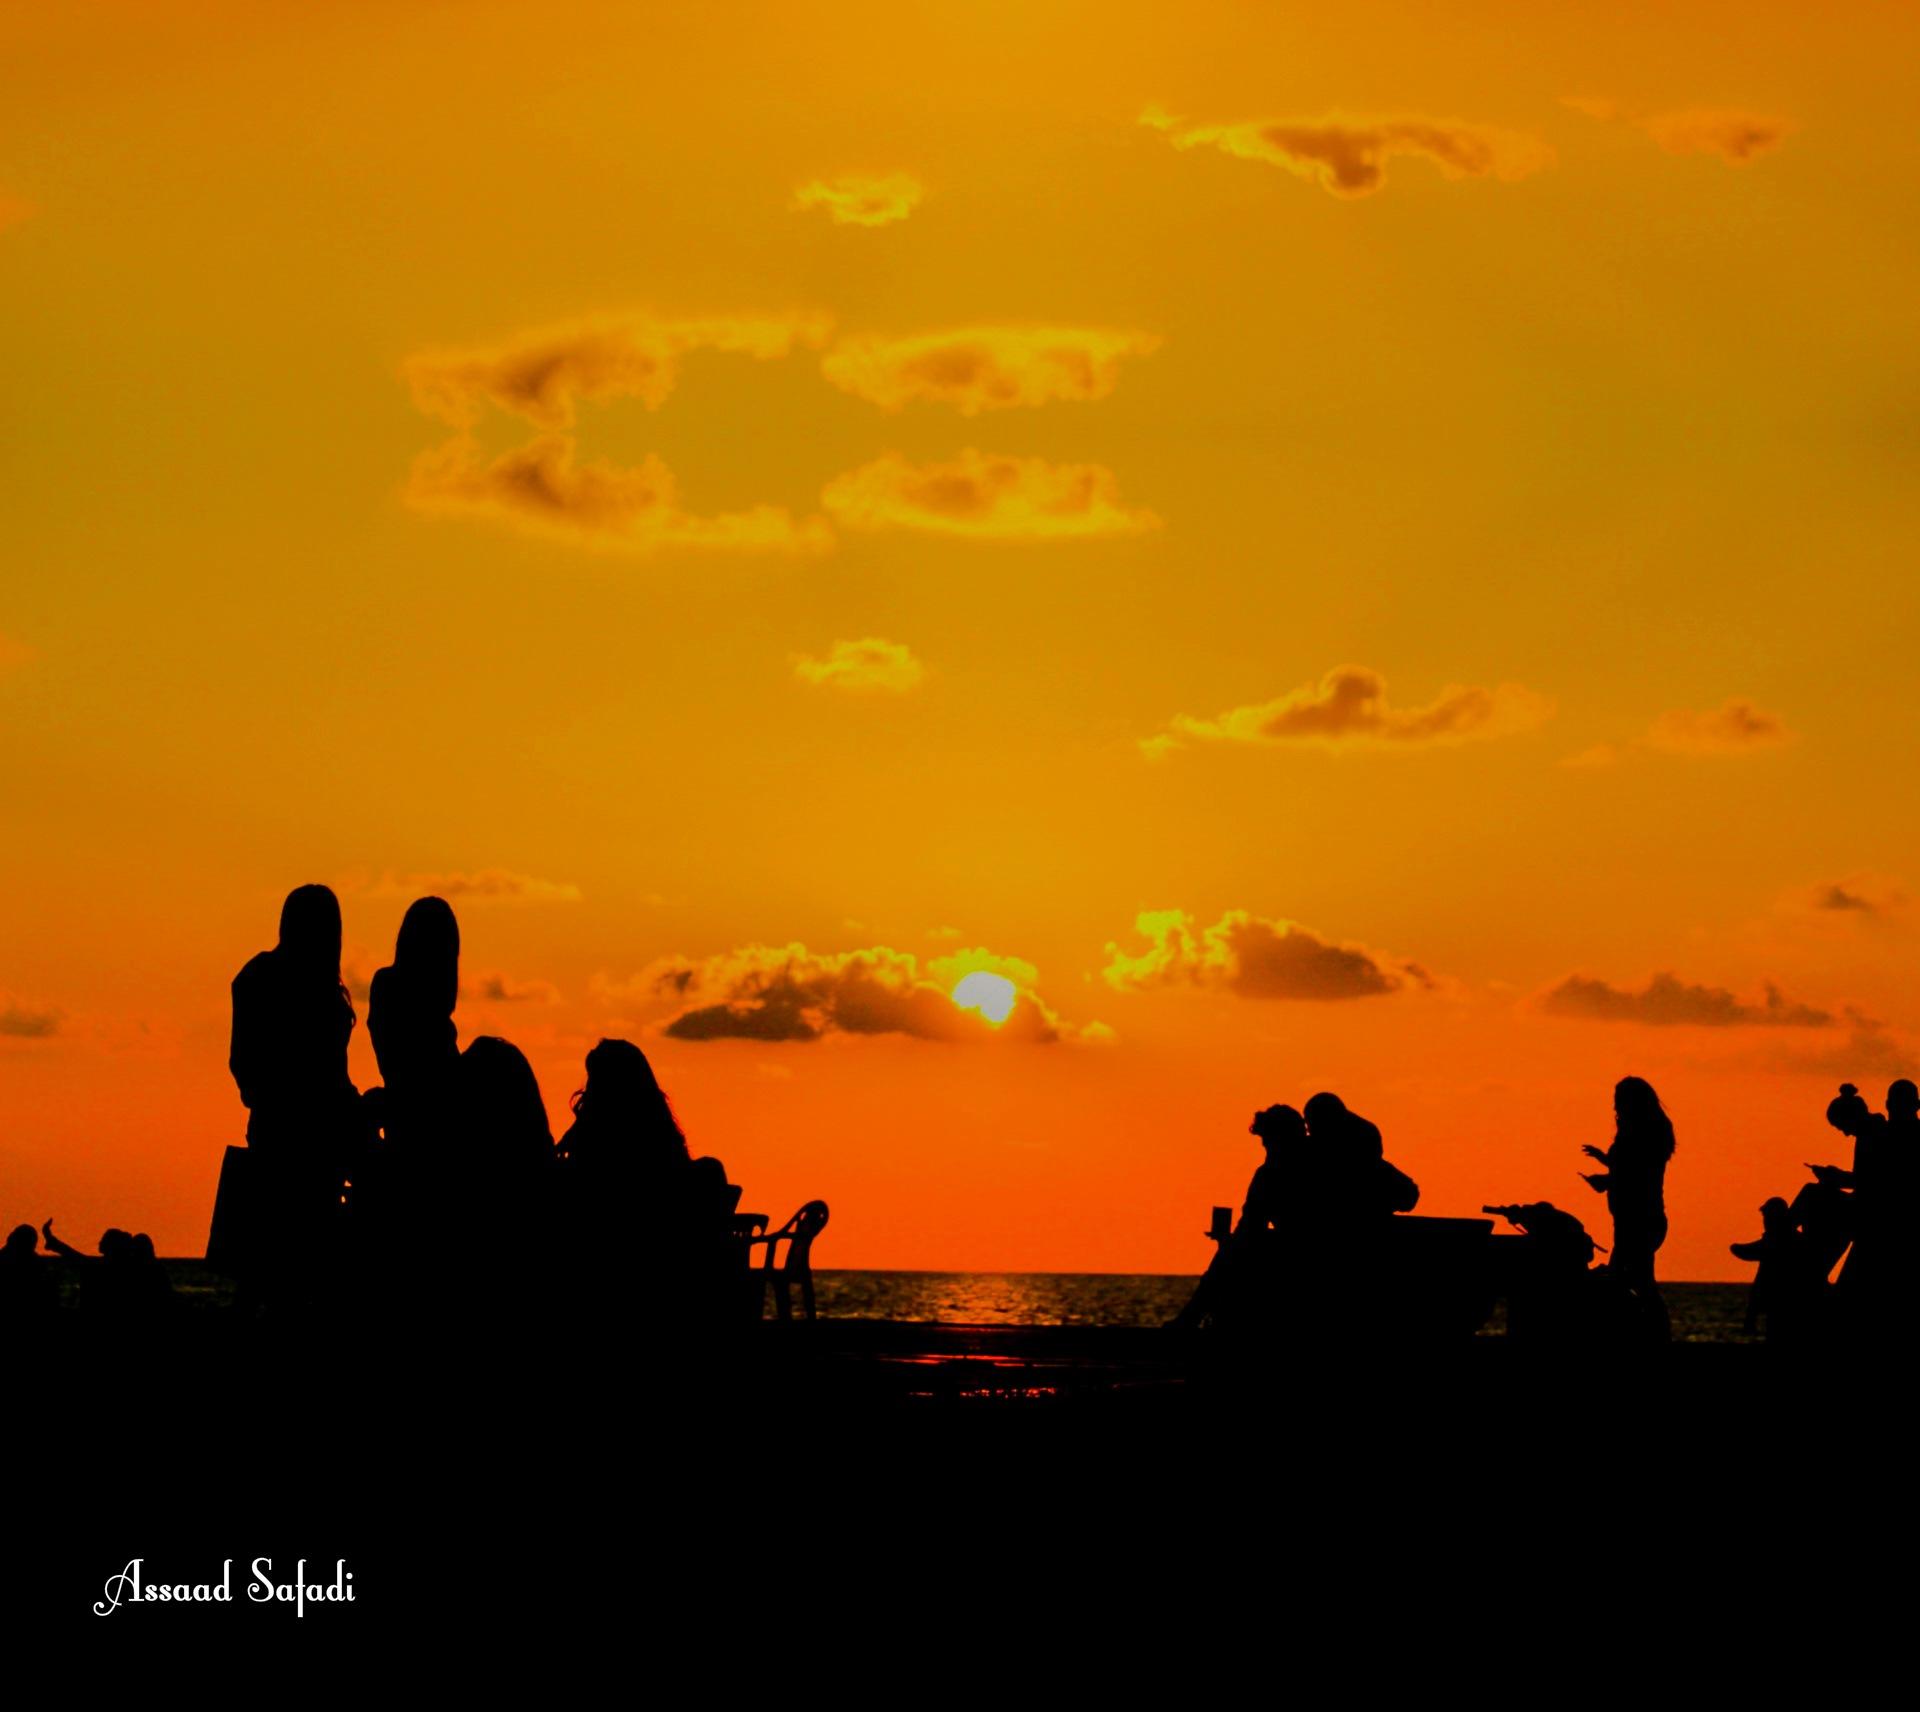 Untitled by Assaad M Safadi